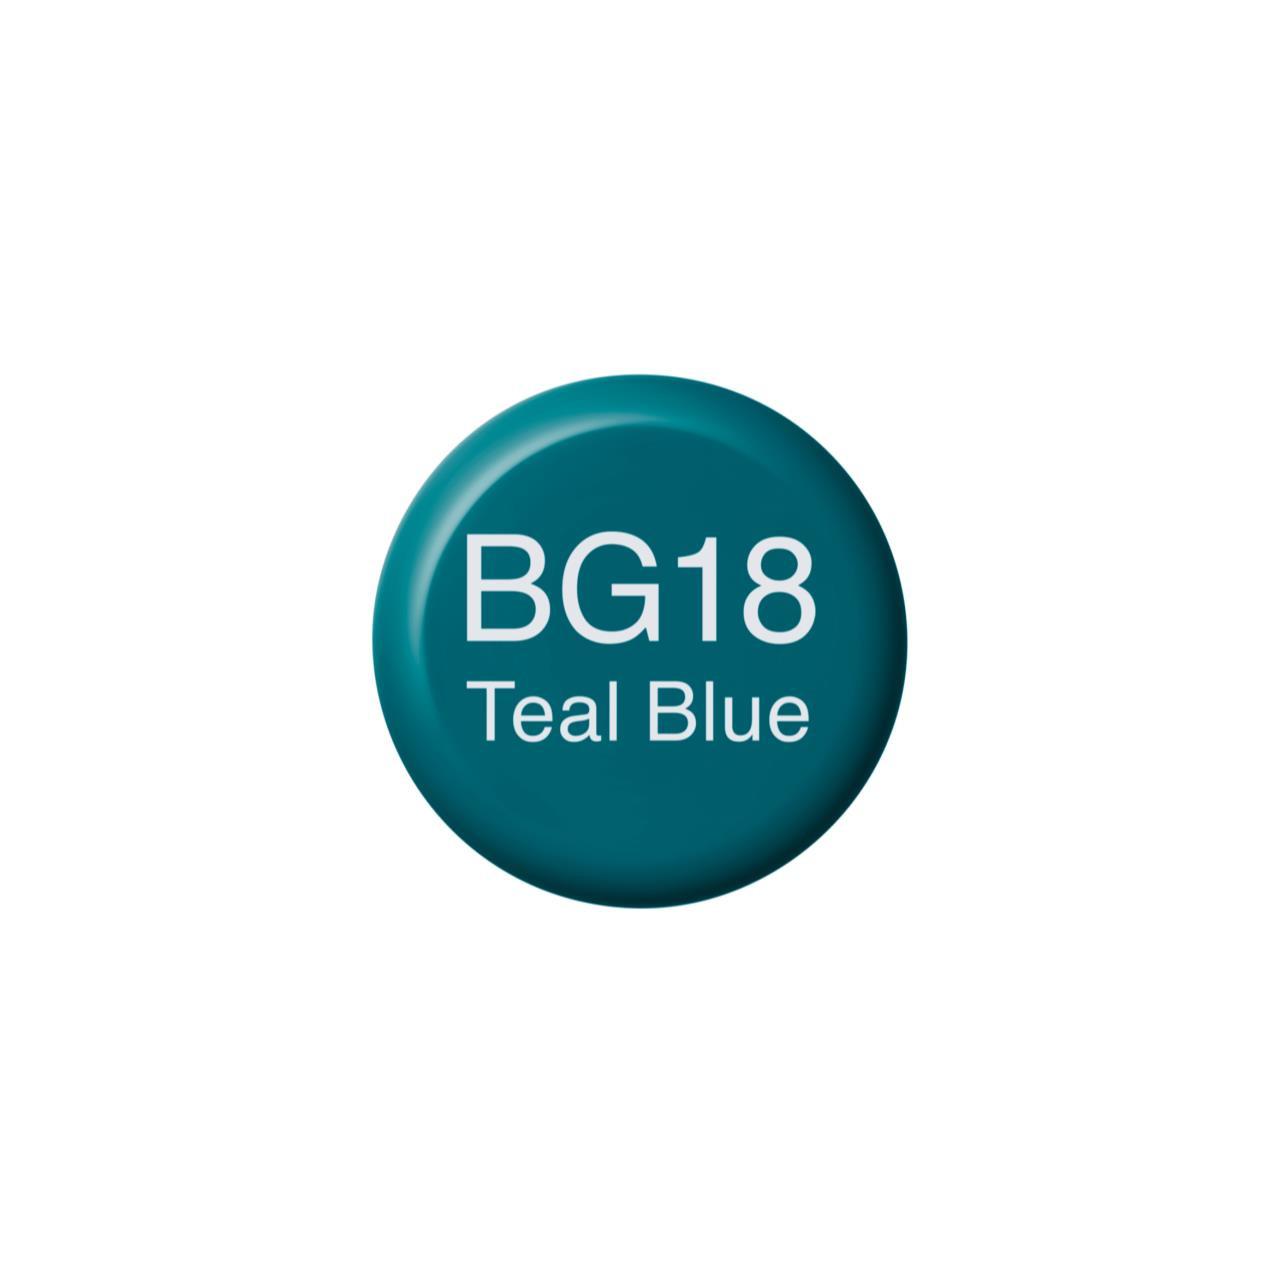 BG18 Teal Blue, Copic Ink - 4511338056264